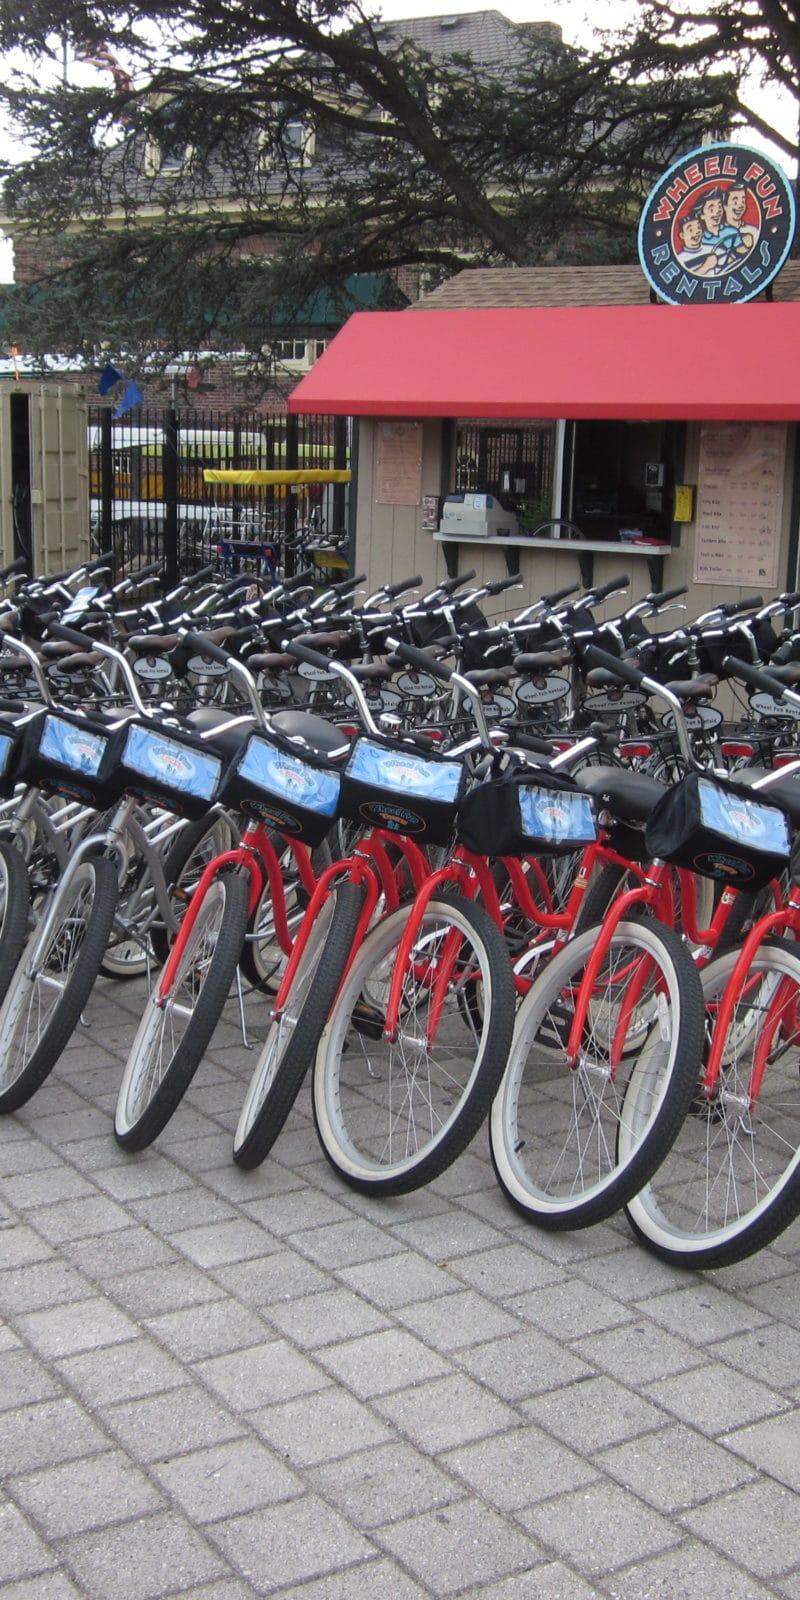 Boathouse Row bike rentals